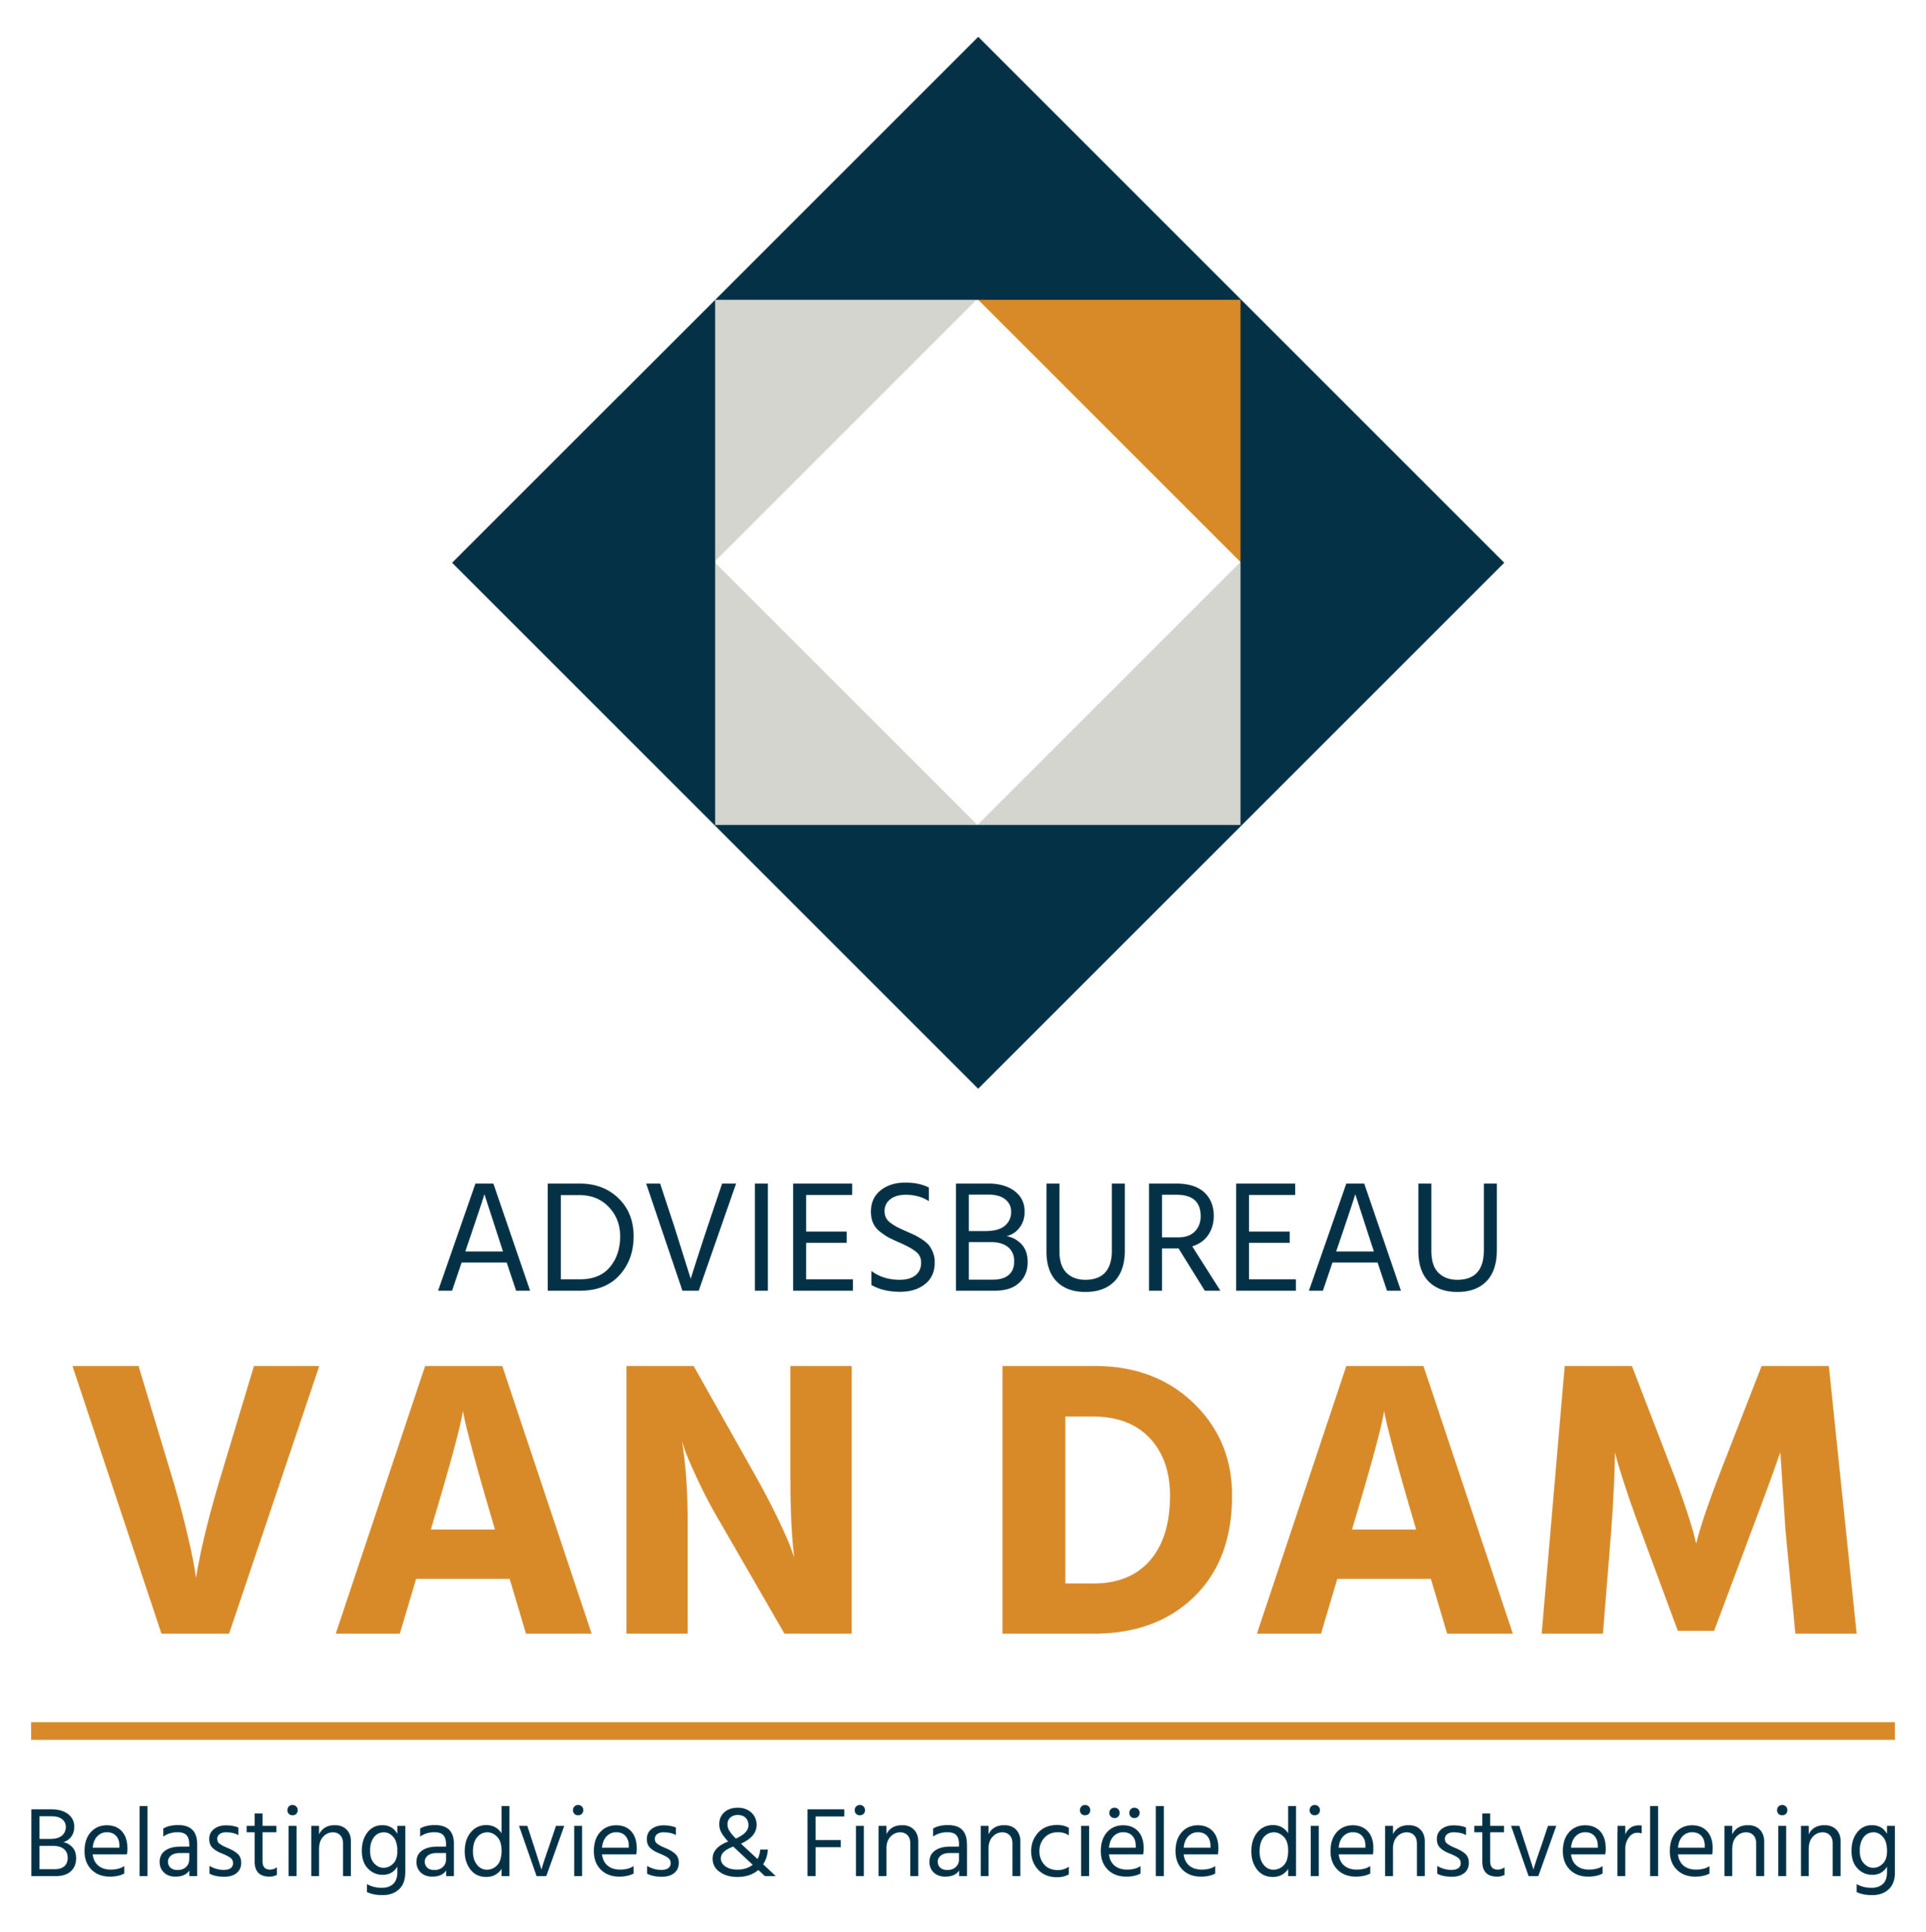 vandam-logo-staand